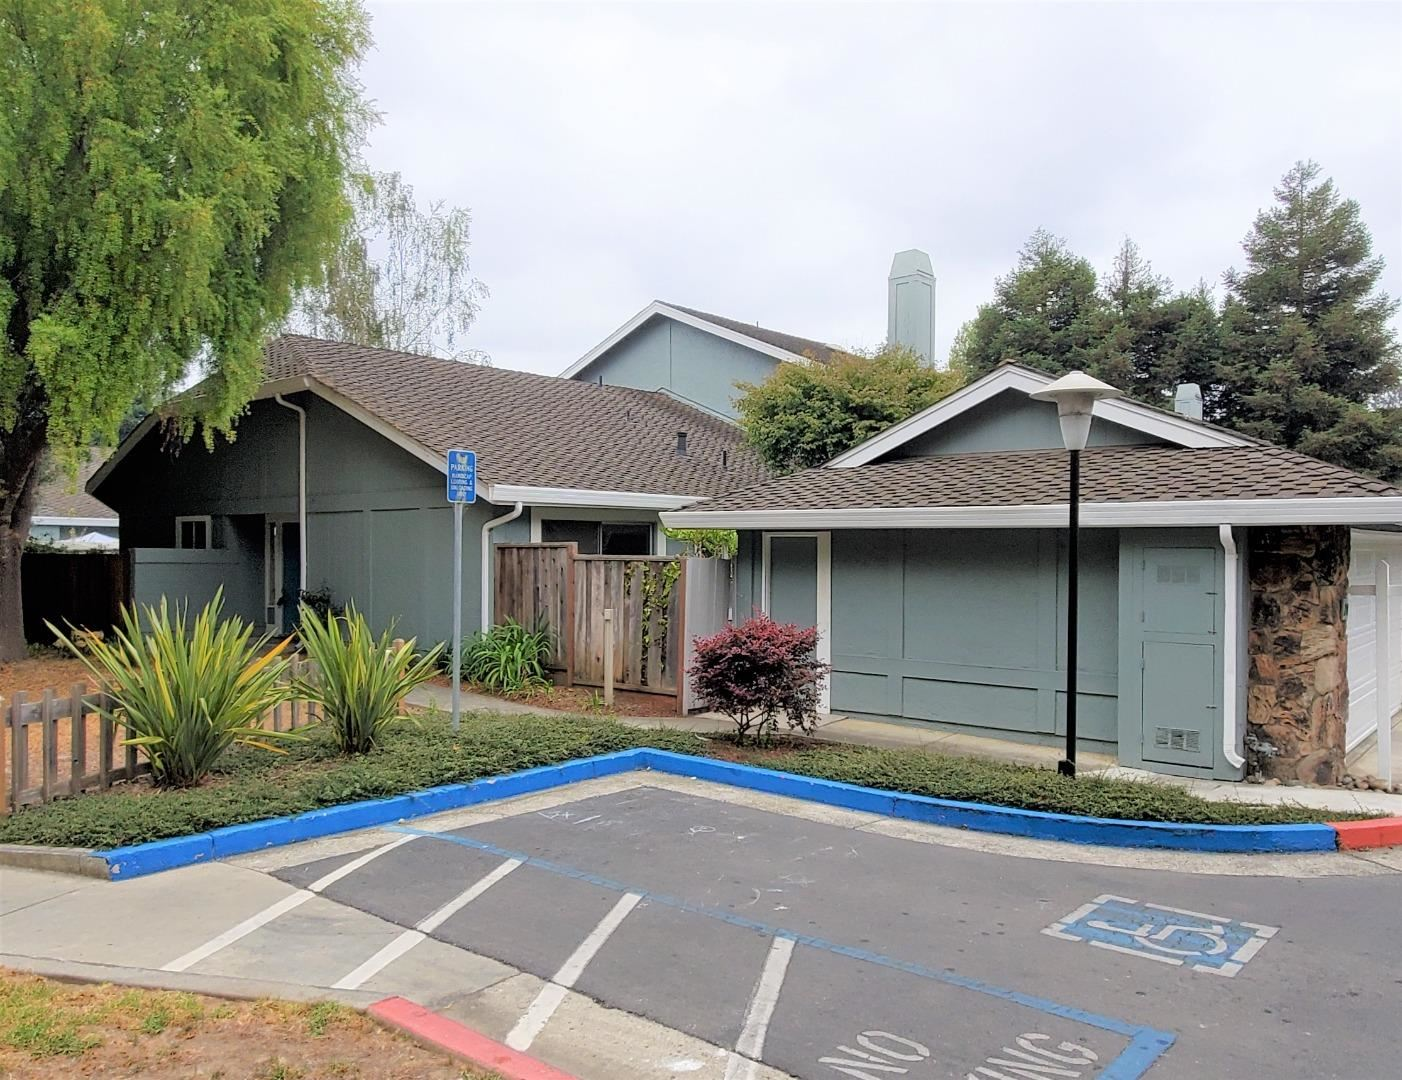 Photo for 298 Barkentine Court, APTOS, CA 95003 (MLS # ML81860882)